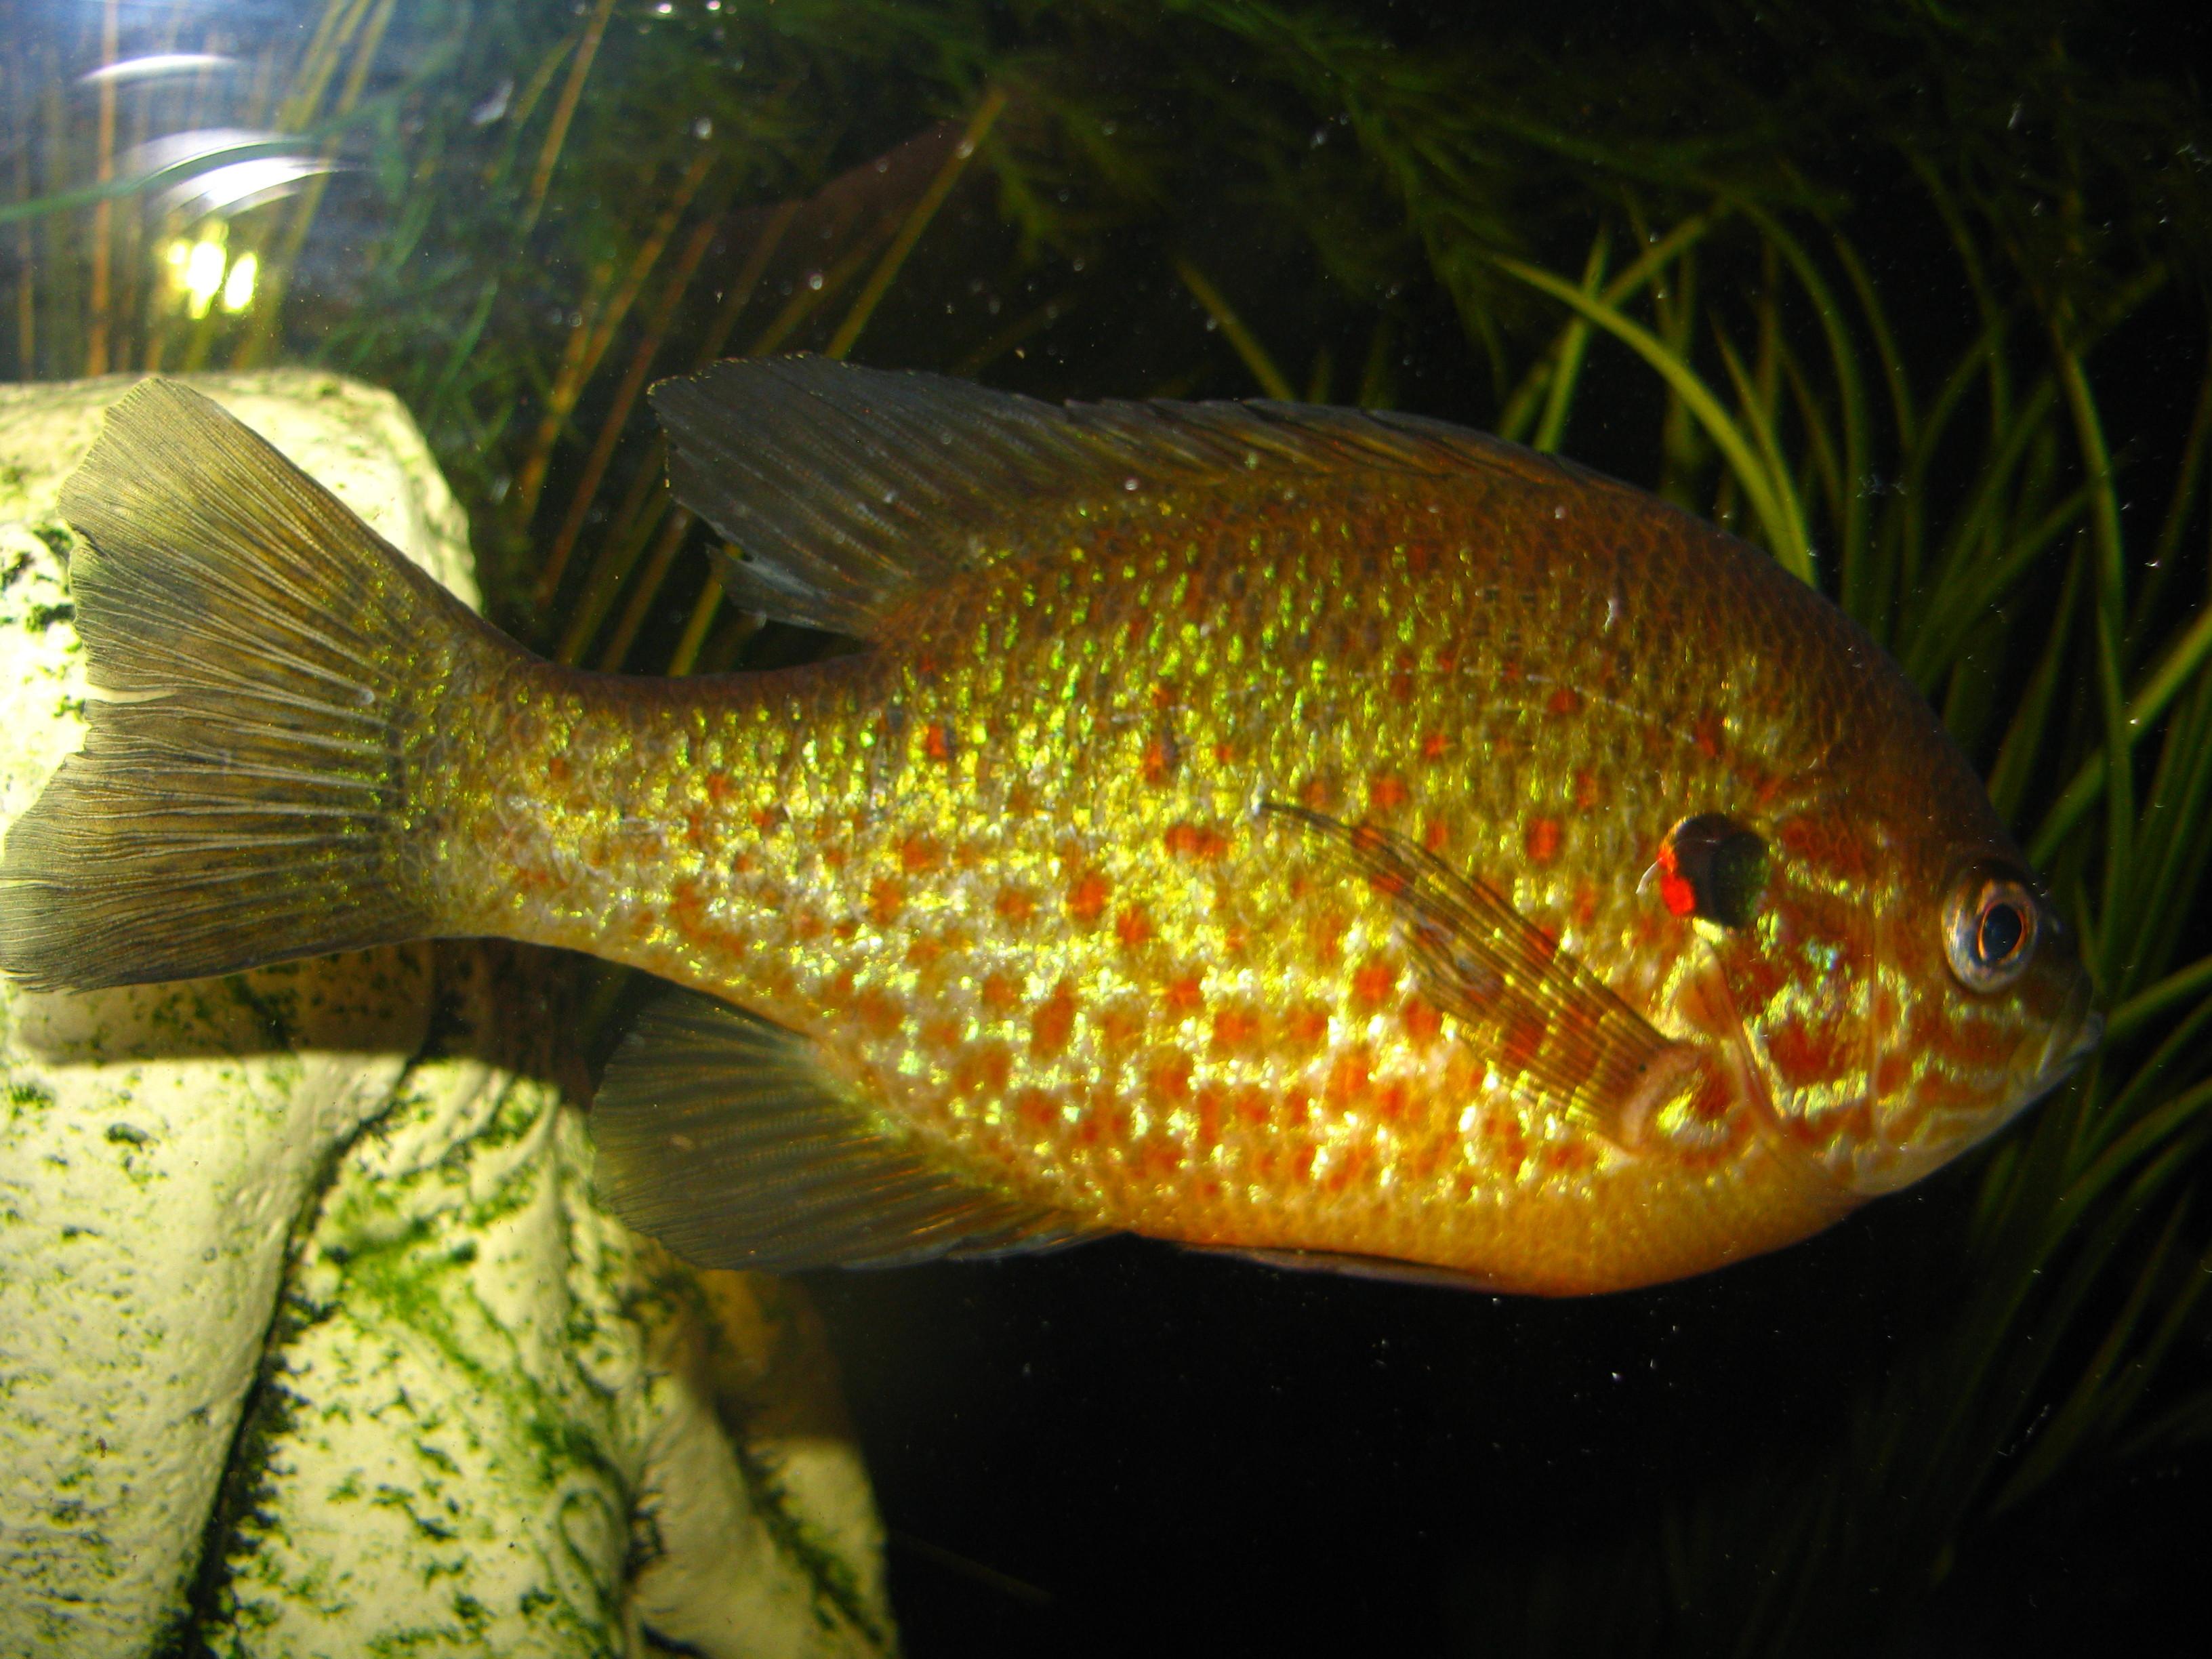 Pumpkinseed : cichlids.com: pumpkinseed sunfish